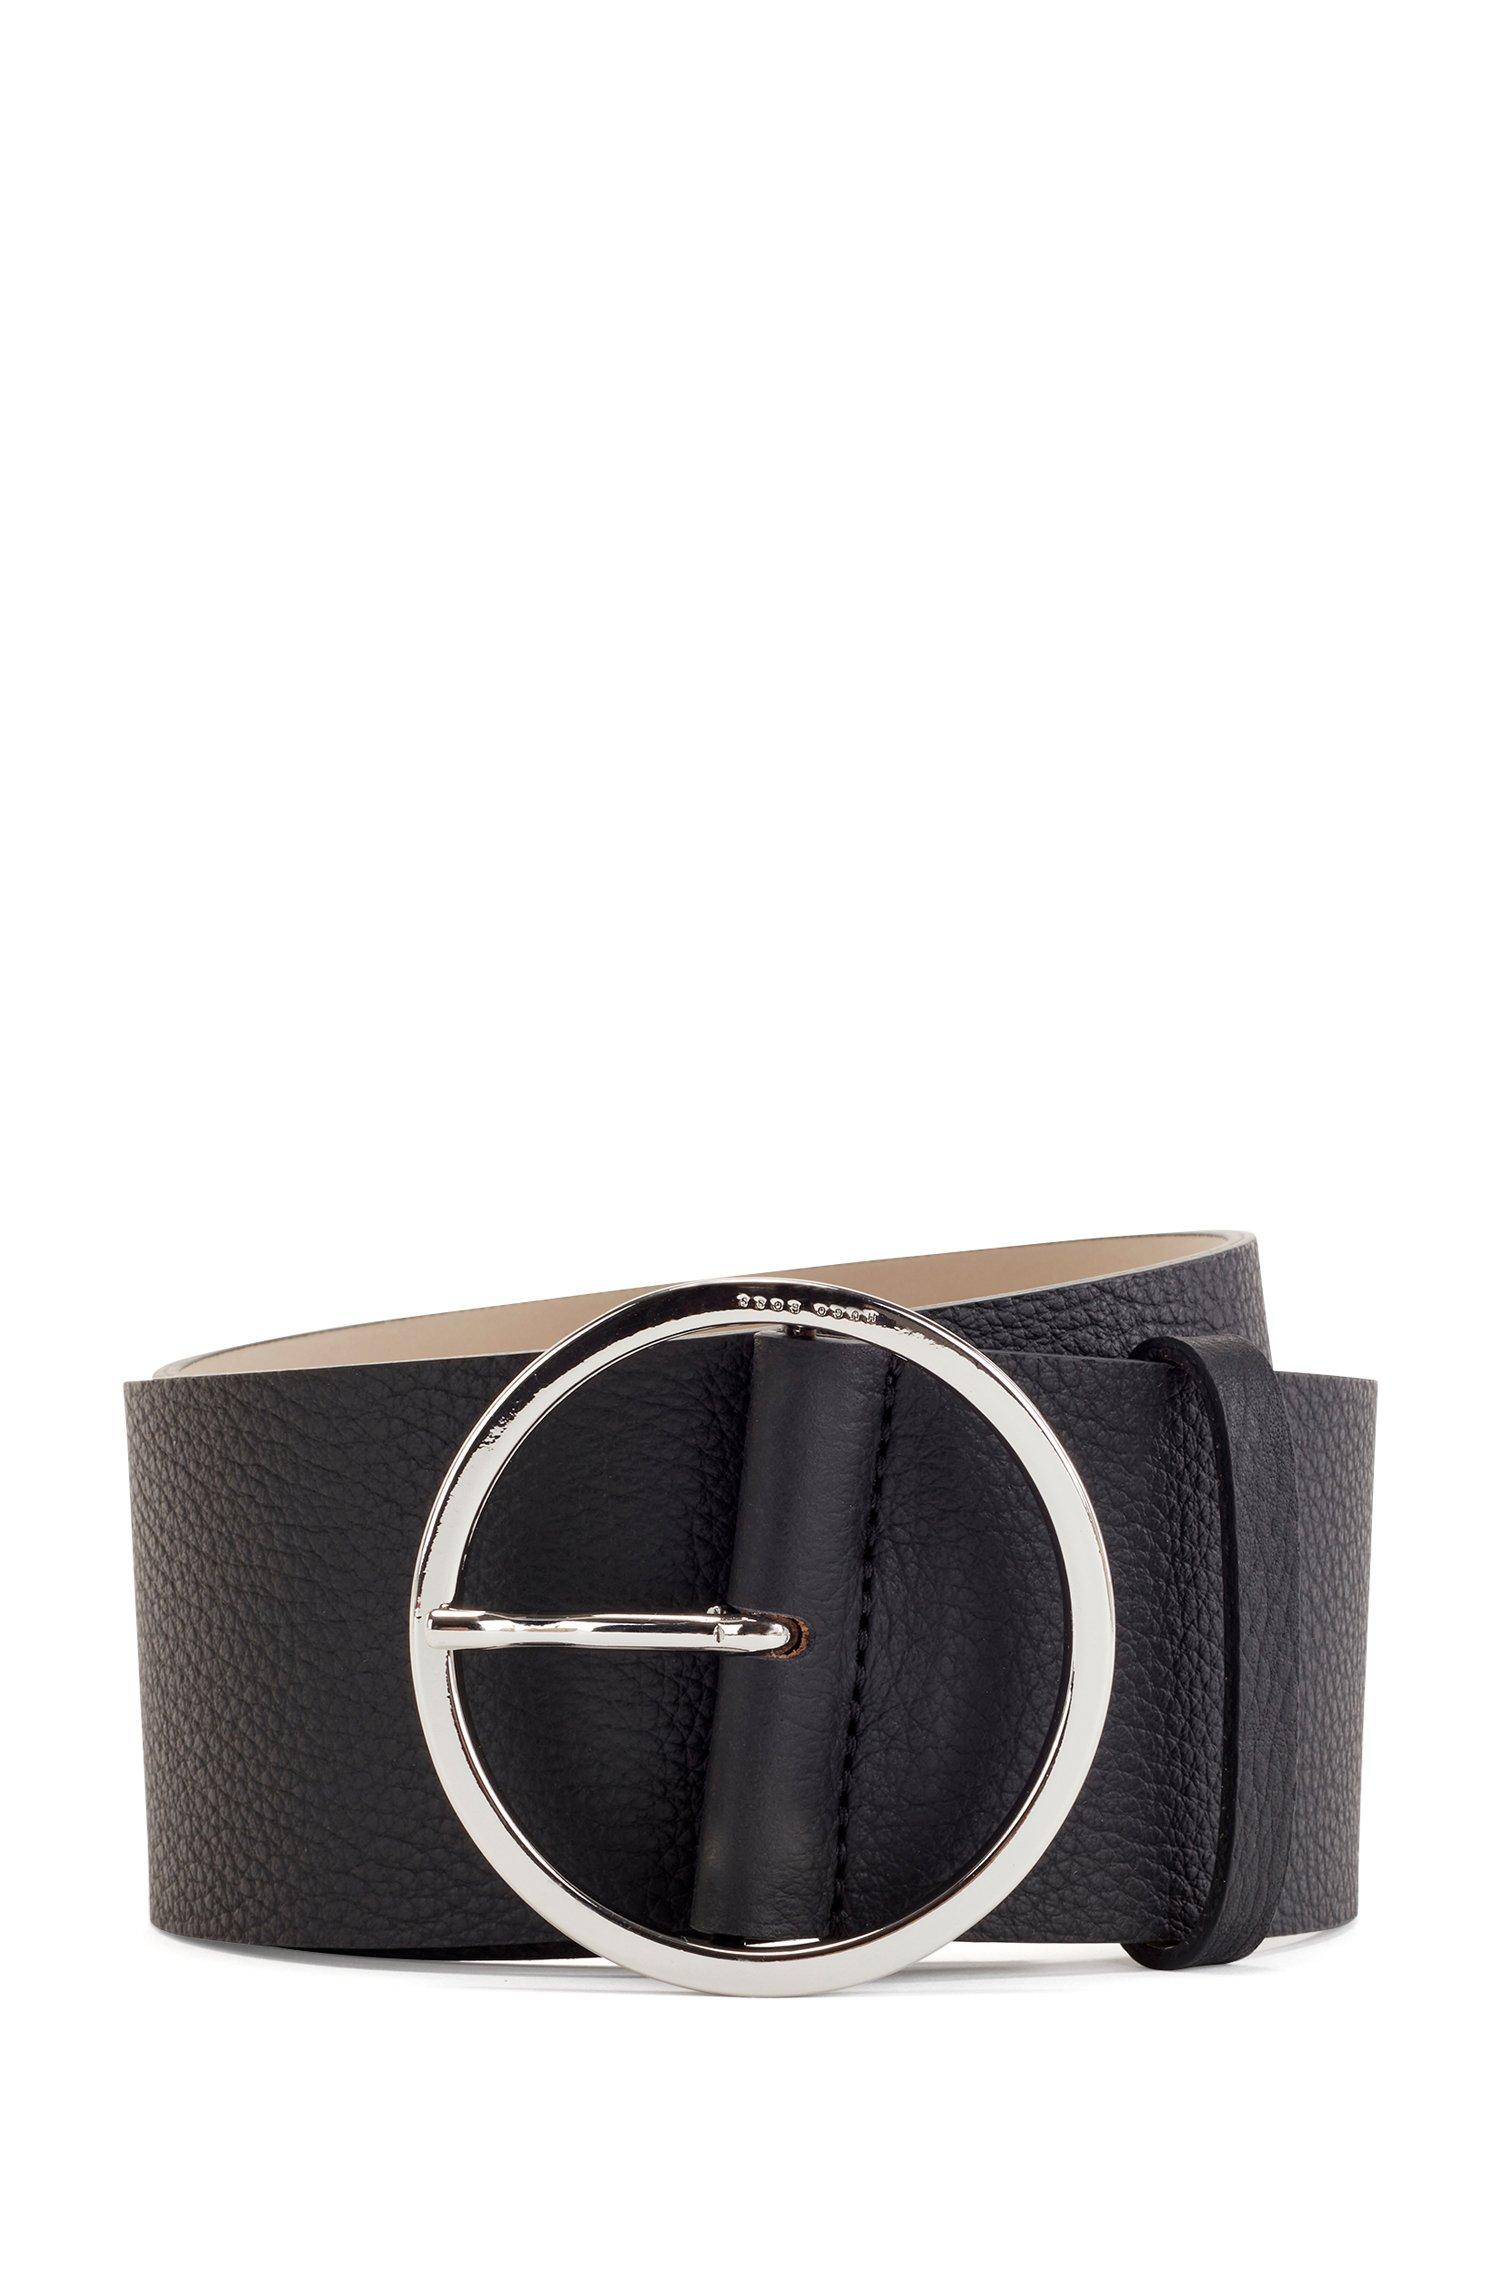 Round-buckle belt in Italian leather, Black